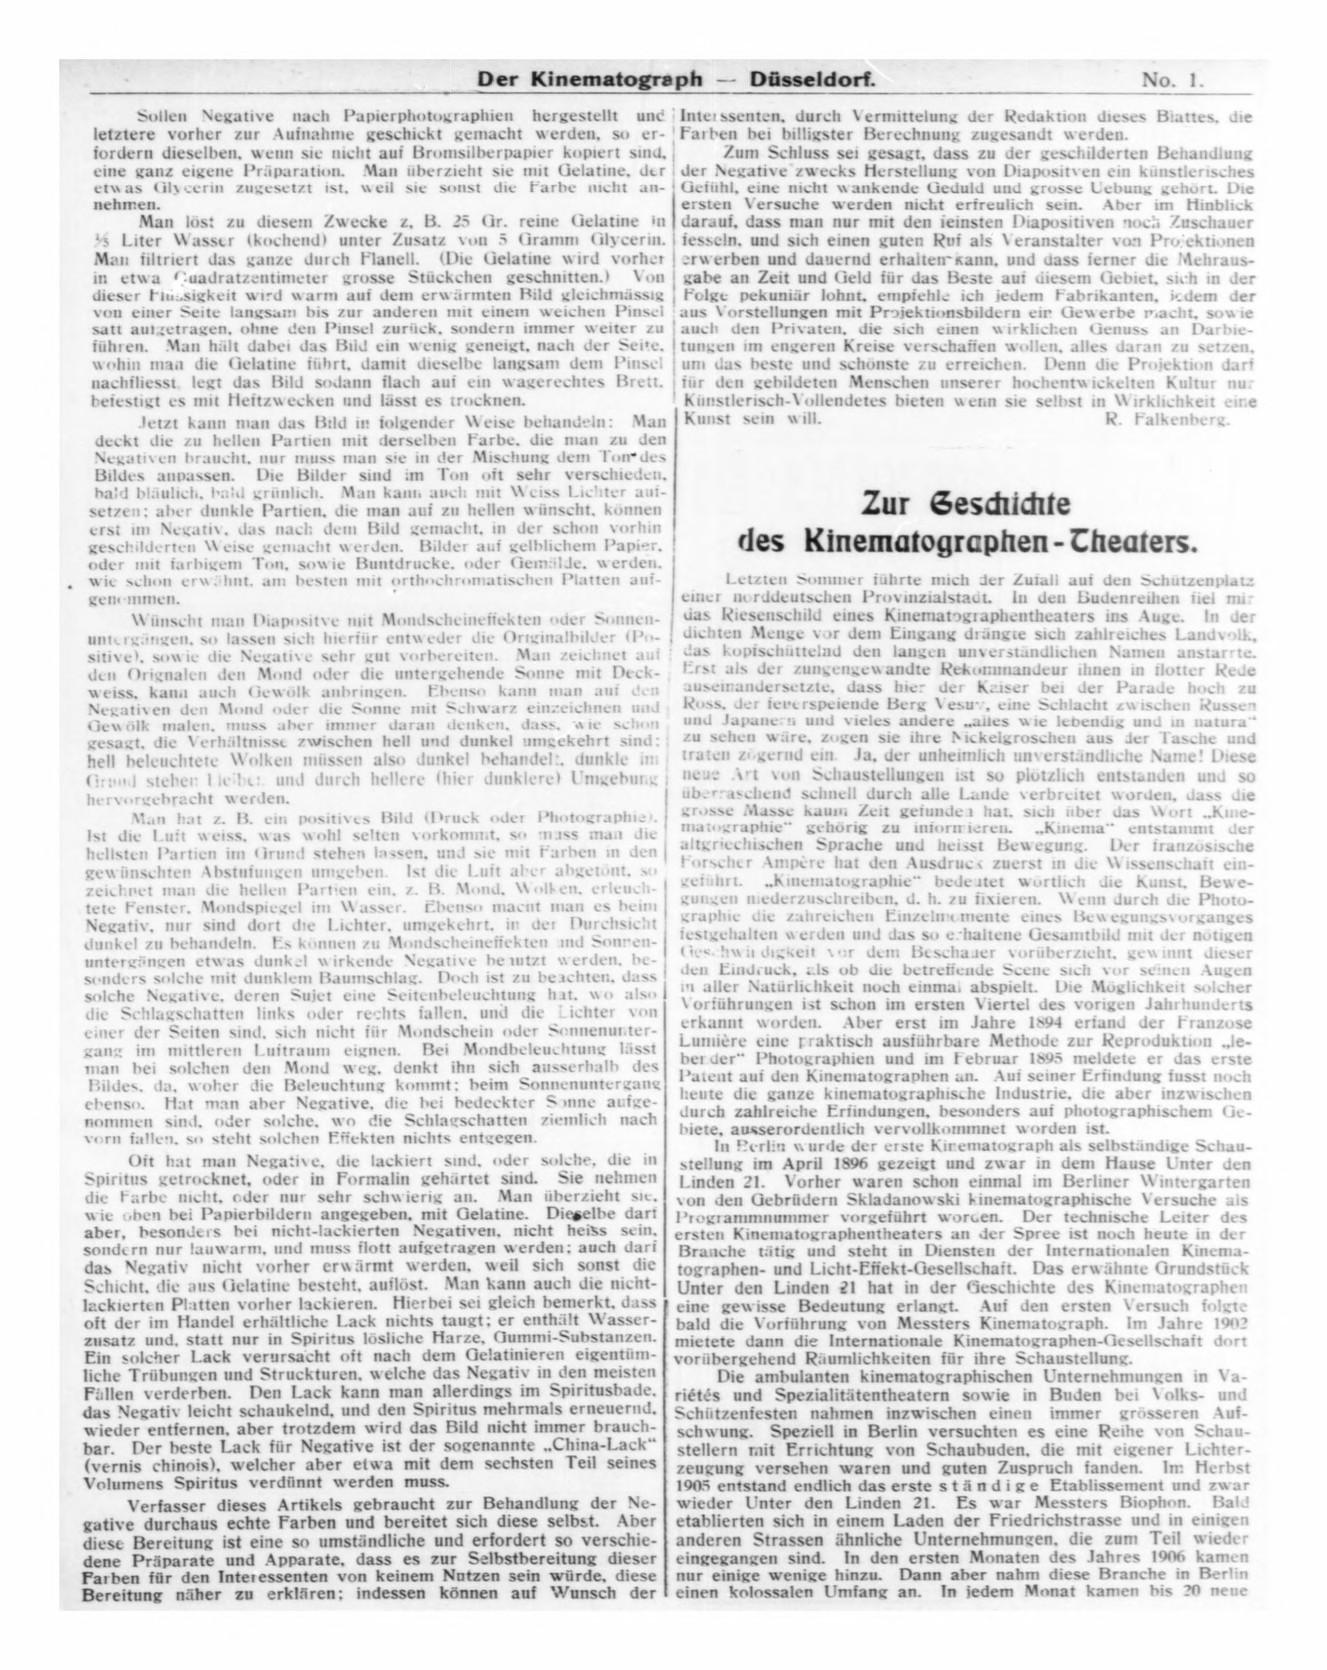 Kinematograph01-1907-01_jp2.zip&file=kinematograph01-1907-01_jp2%2fkinematograph01-1907-01_0006